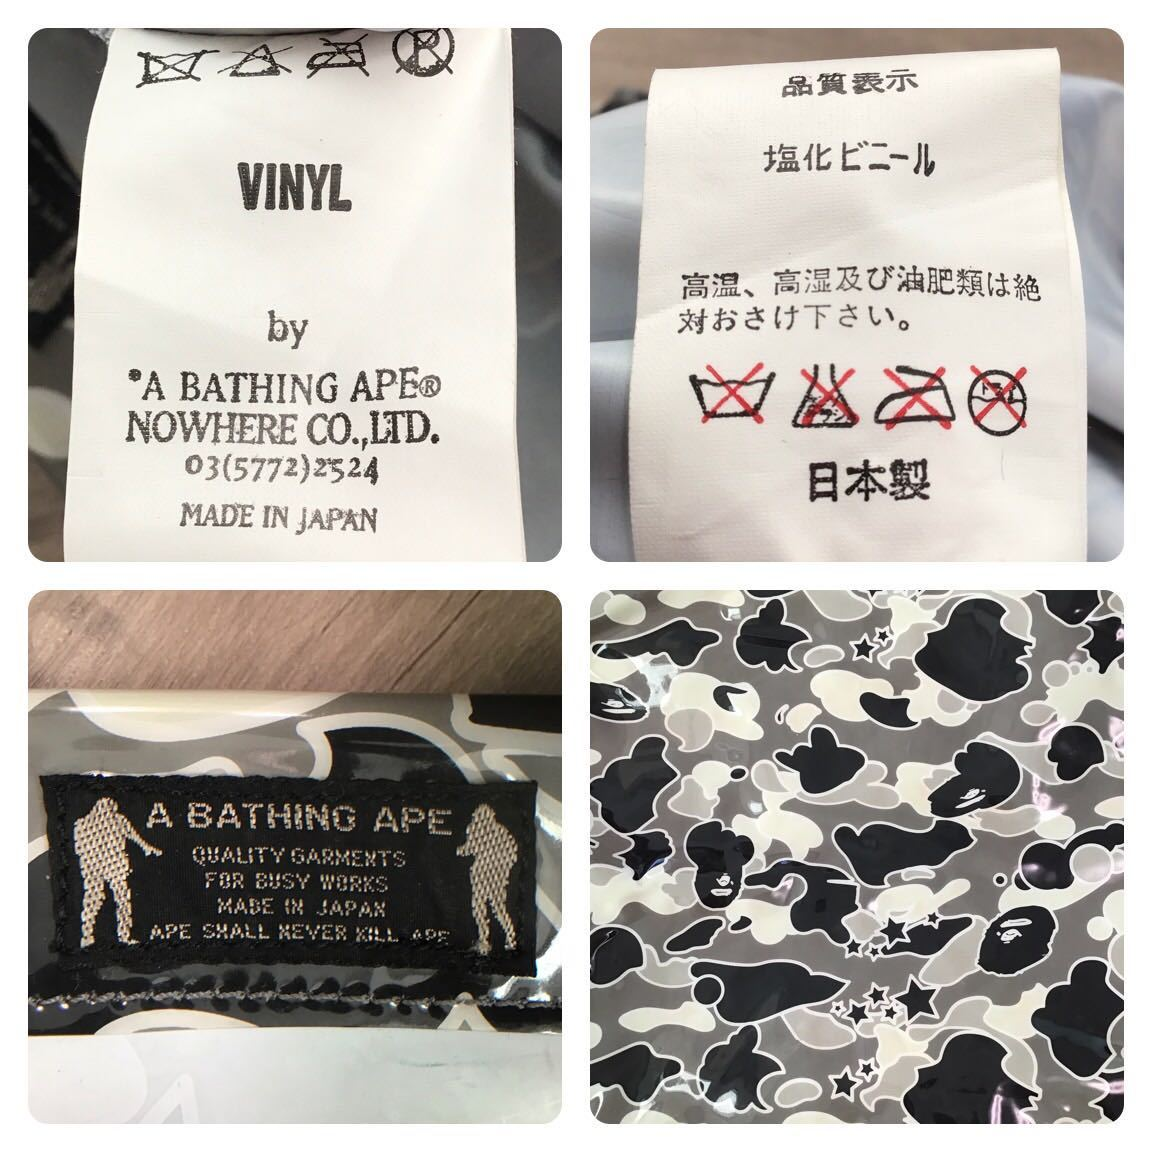 sta camo ビニール トート バッグ a bathing ape bape tote bag エイプ ベイプ アベイシングエイプ psyche camo サイケ 迷彩 nigo 2121